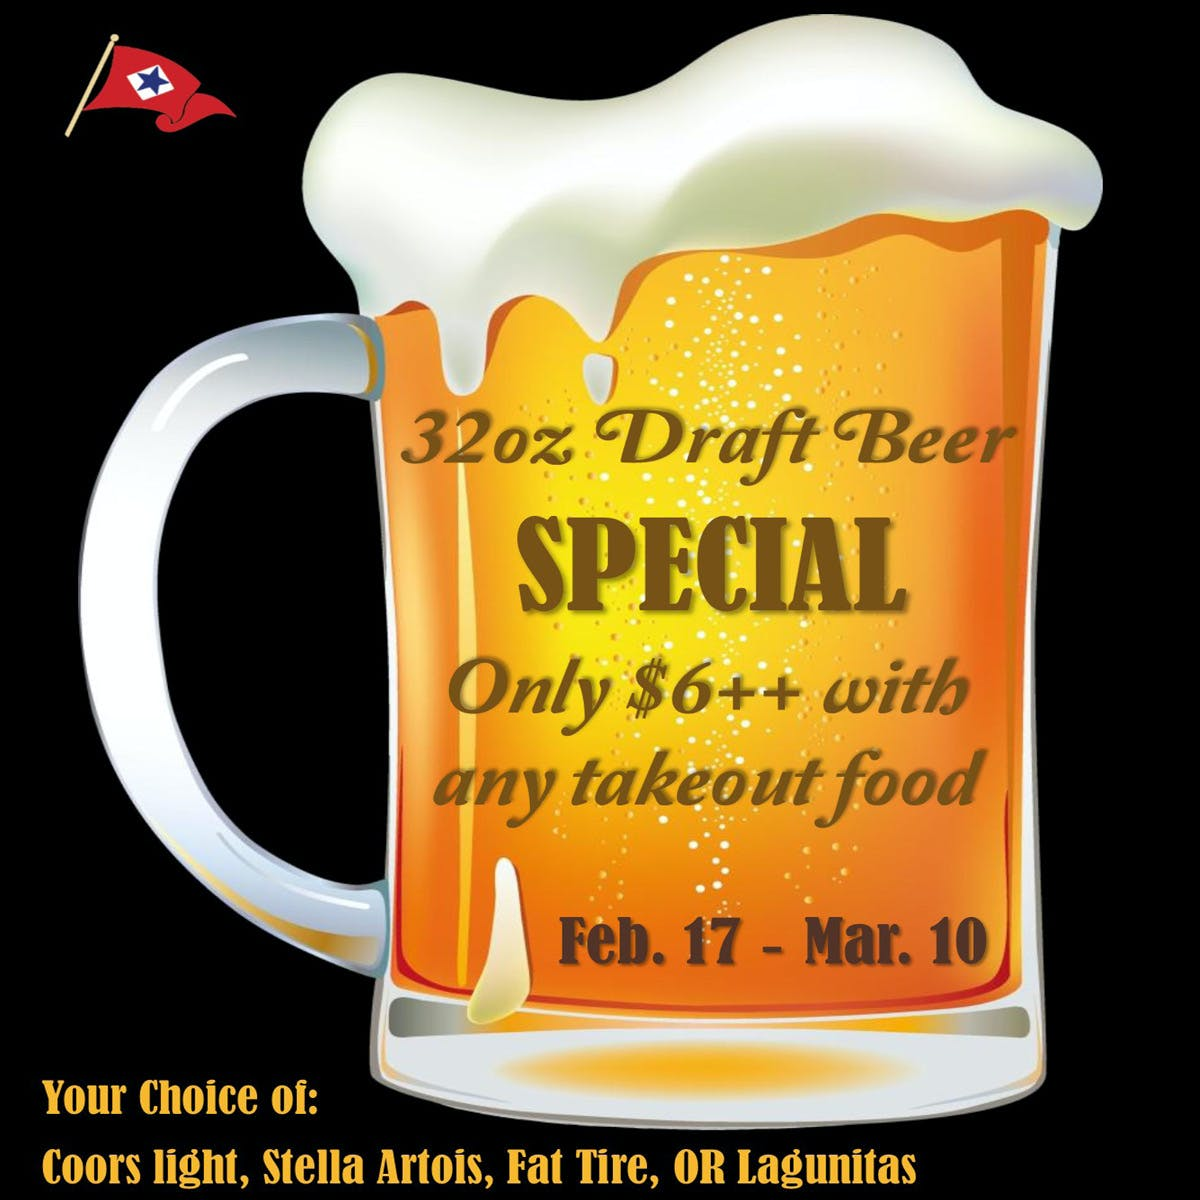 Draft Beer Special